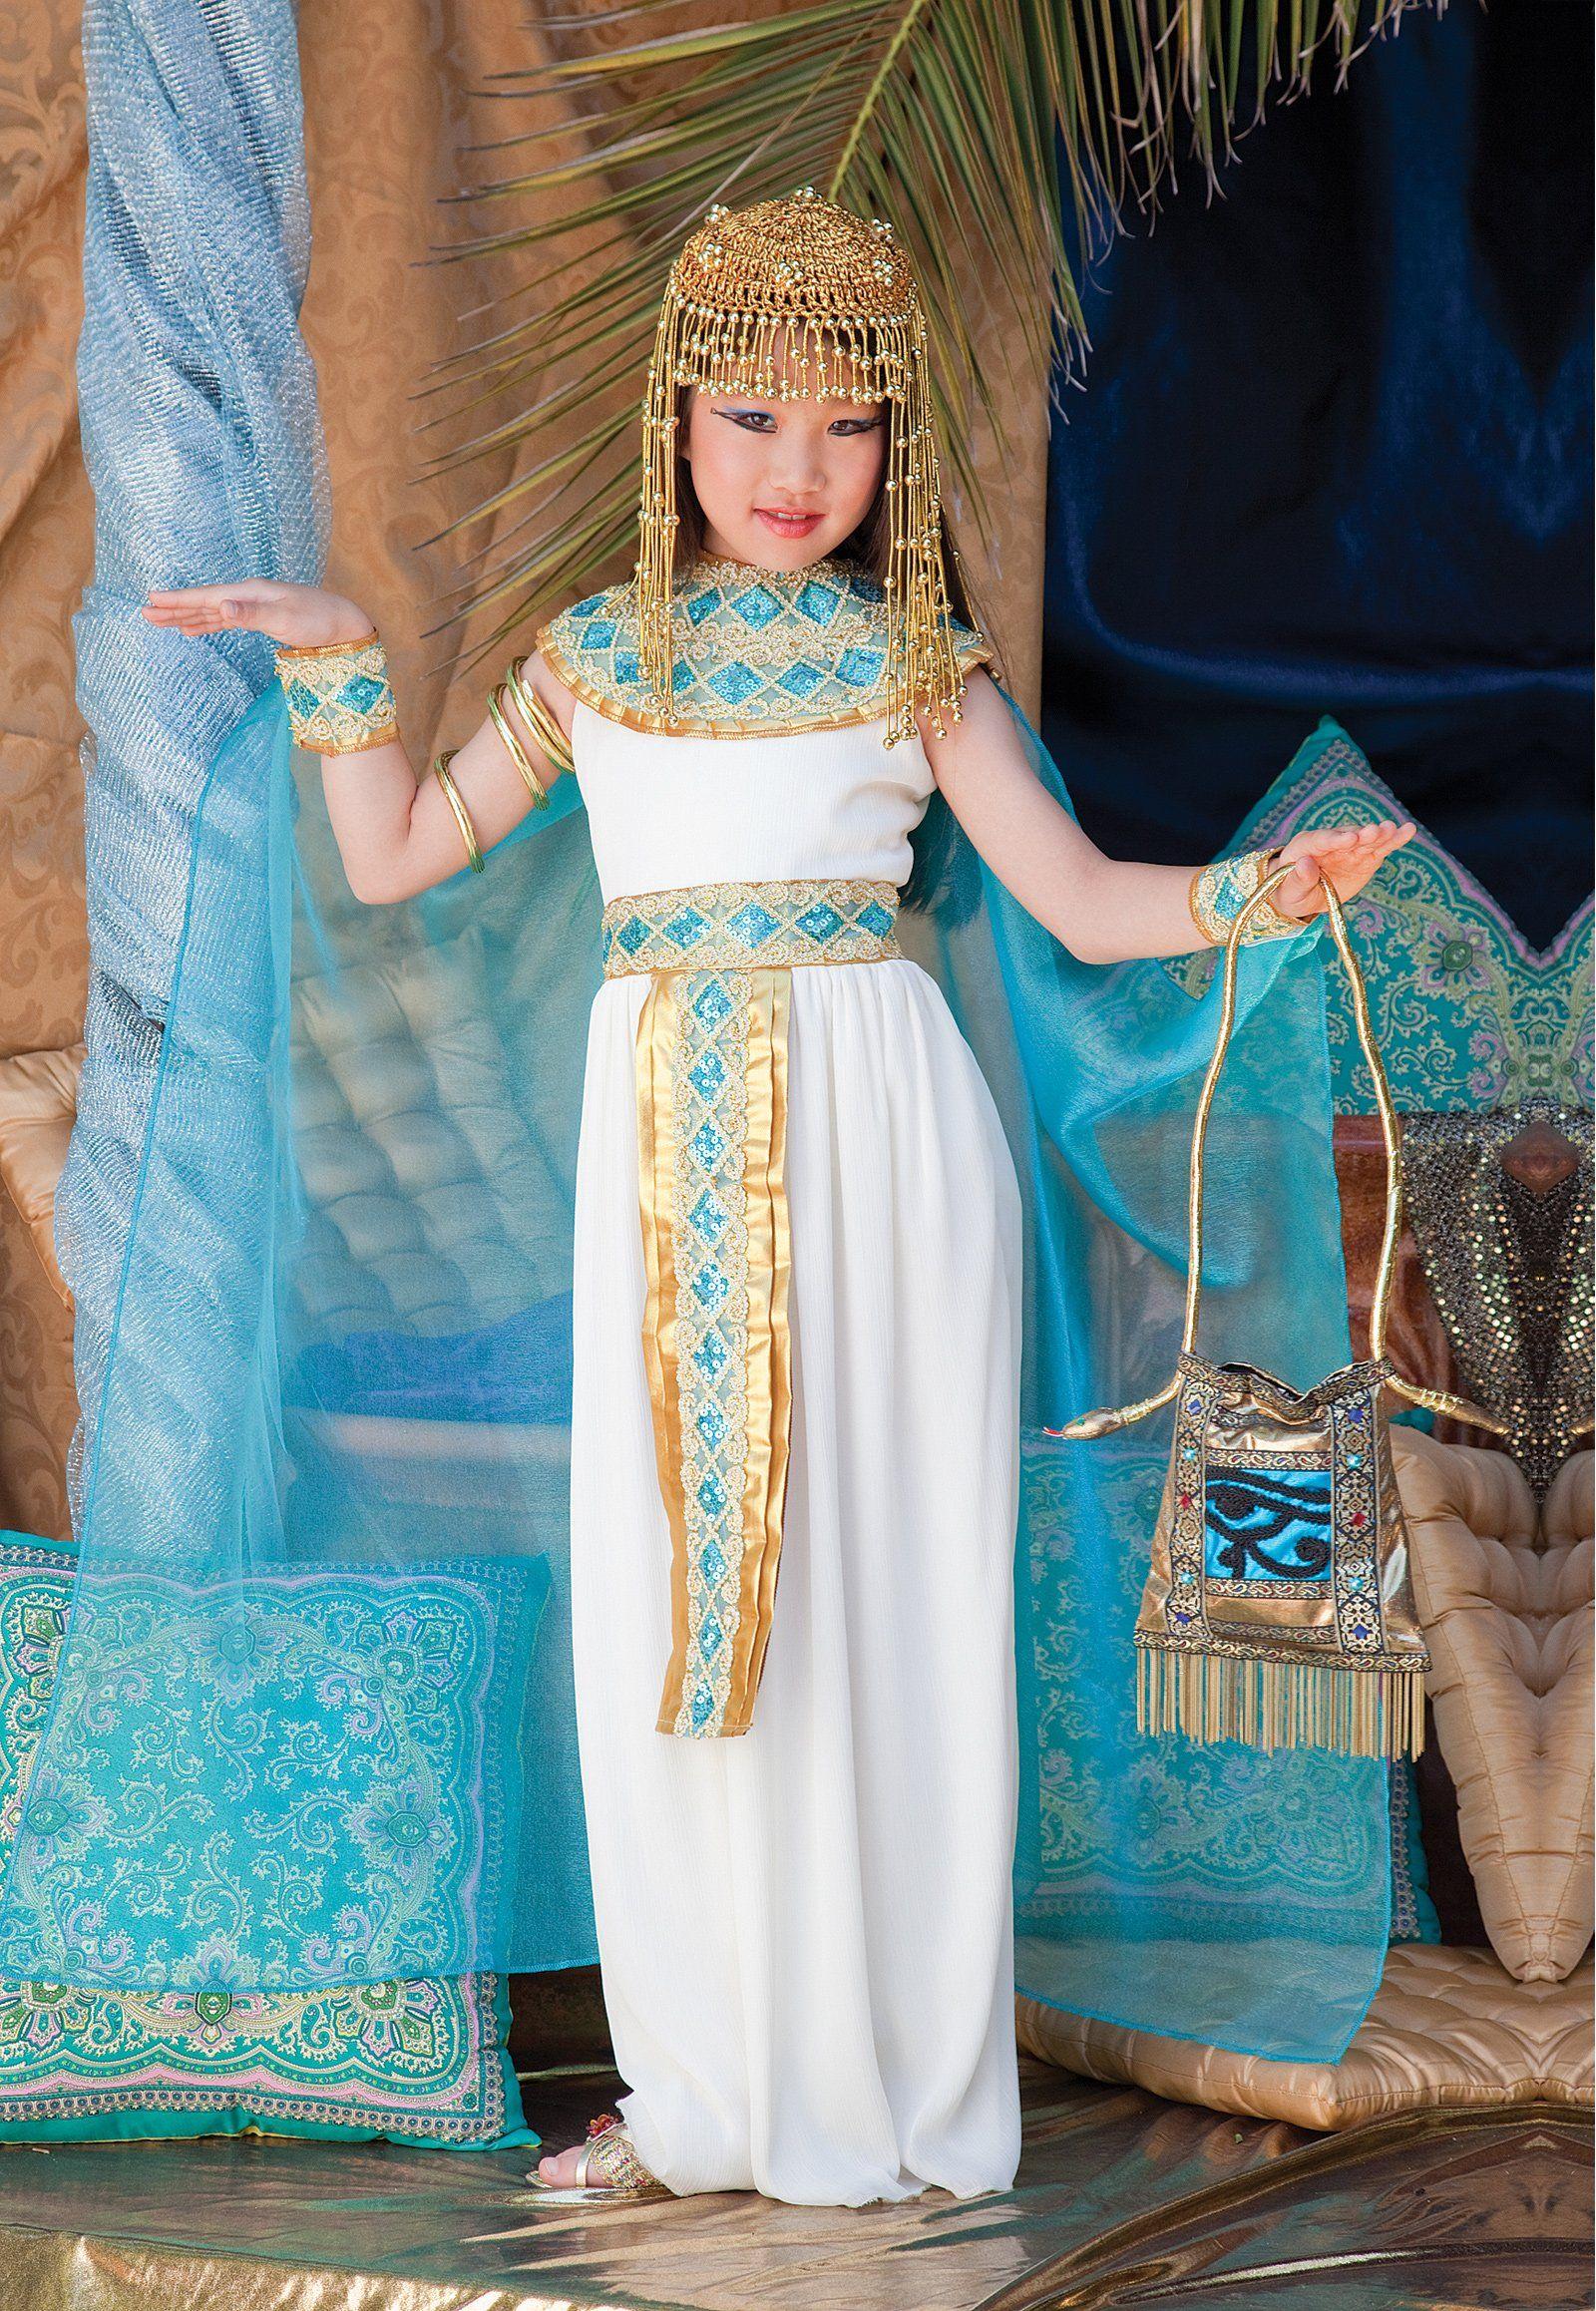 cleopatra child costume kost m fasching und zirkus kost me. Black Bedroom Furniture Sets. Home Design Ideas